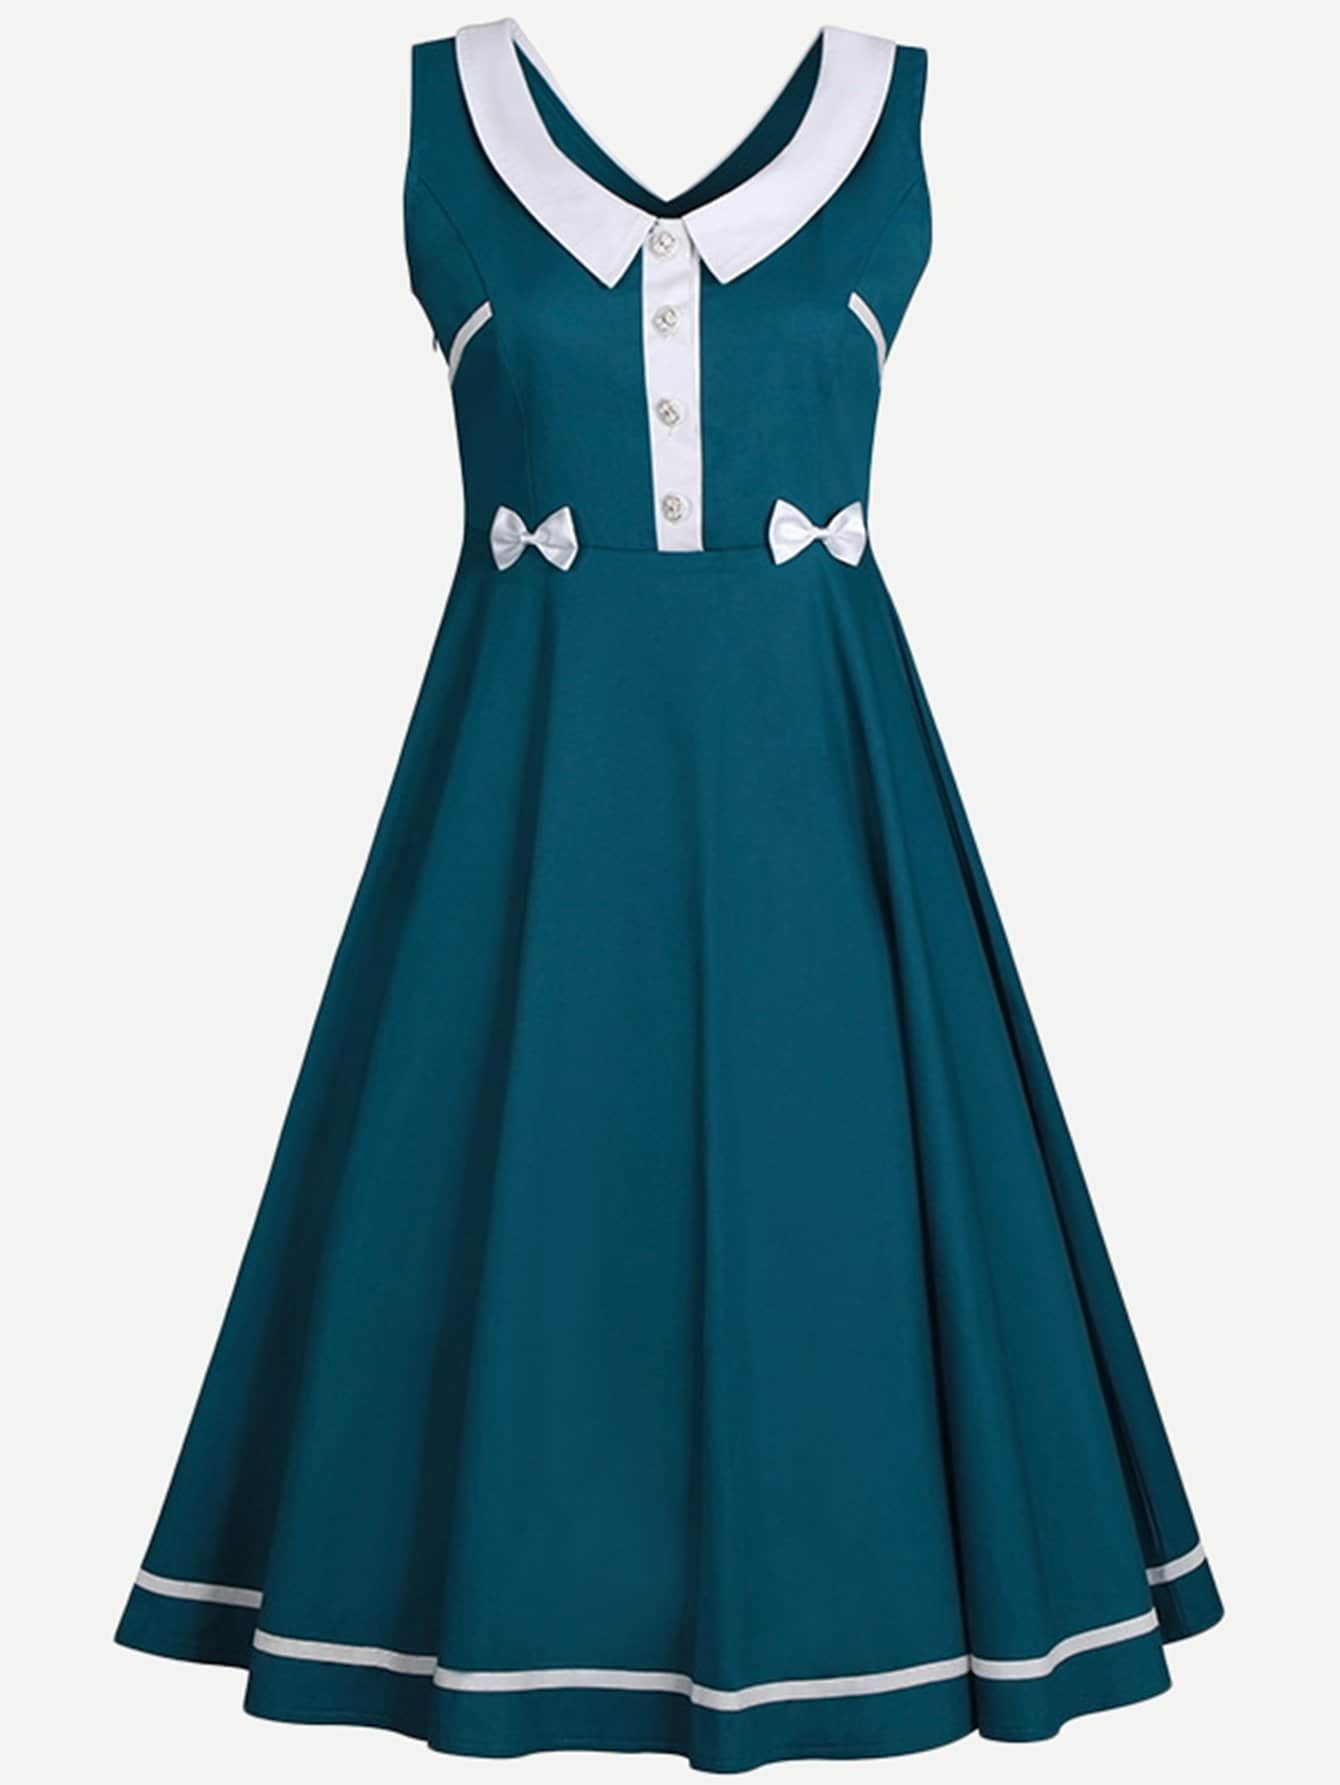 Contrast Collar Button Detail Dress contrast pu grommet detail dress with necklace